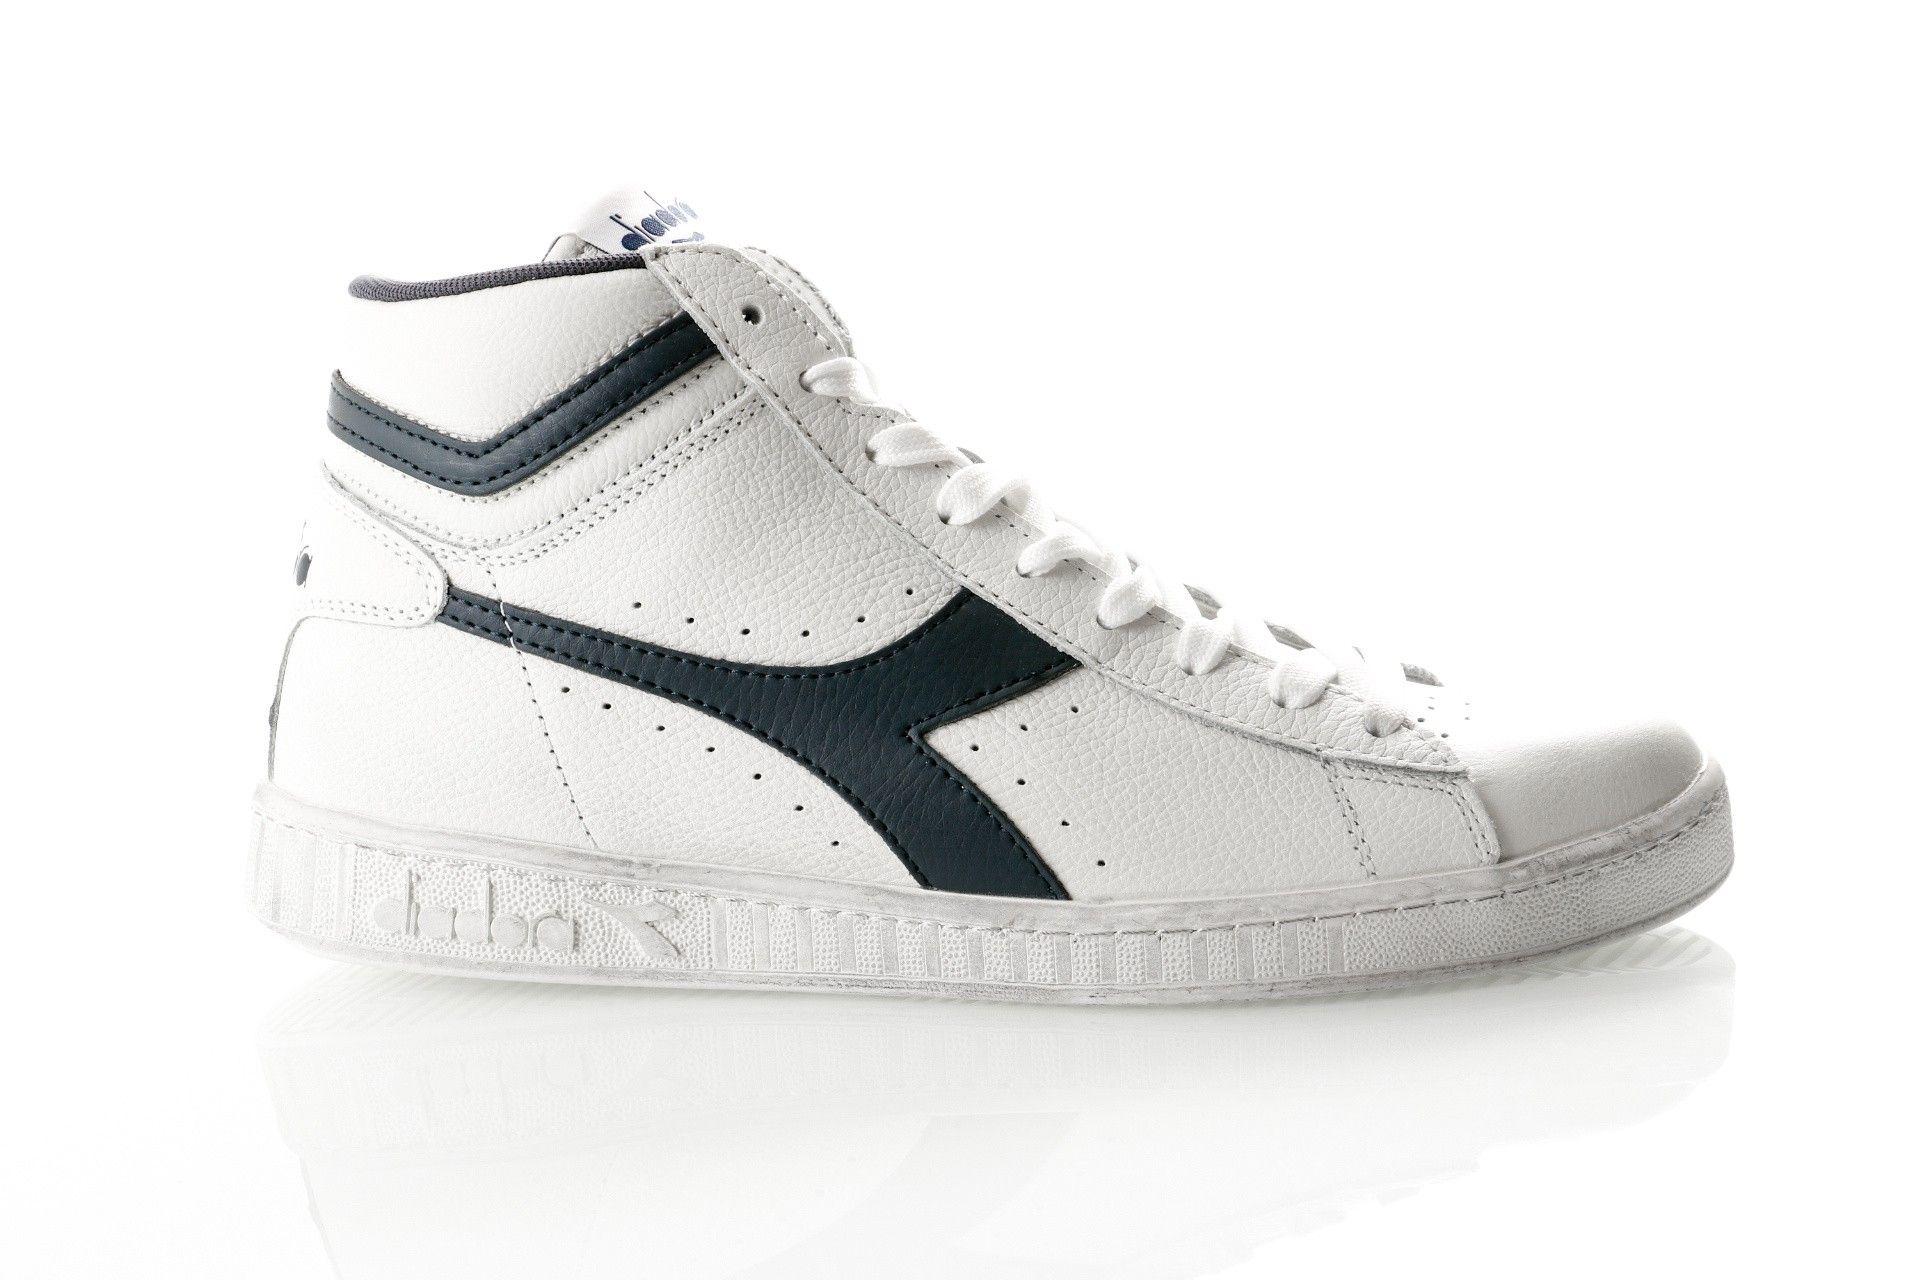 Afbeelding van Diadora Game L High Waxed 501159657 Sneakers White/Blue Caspian Sea